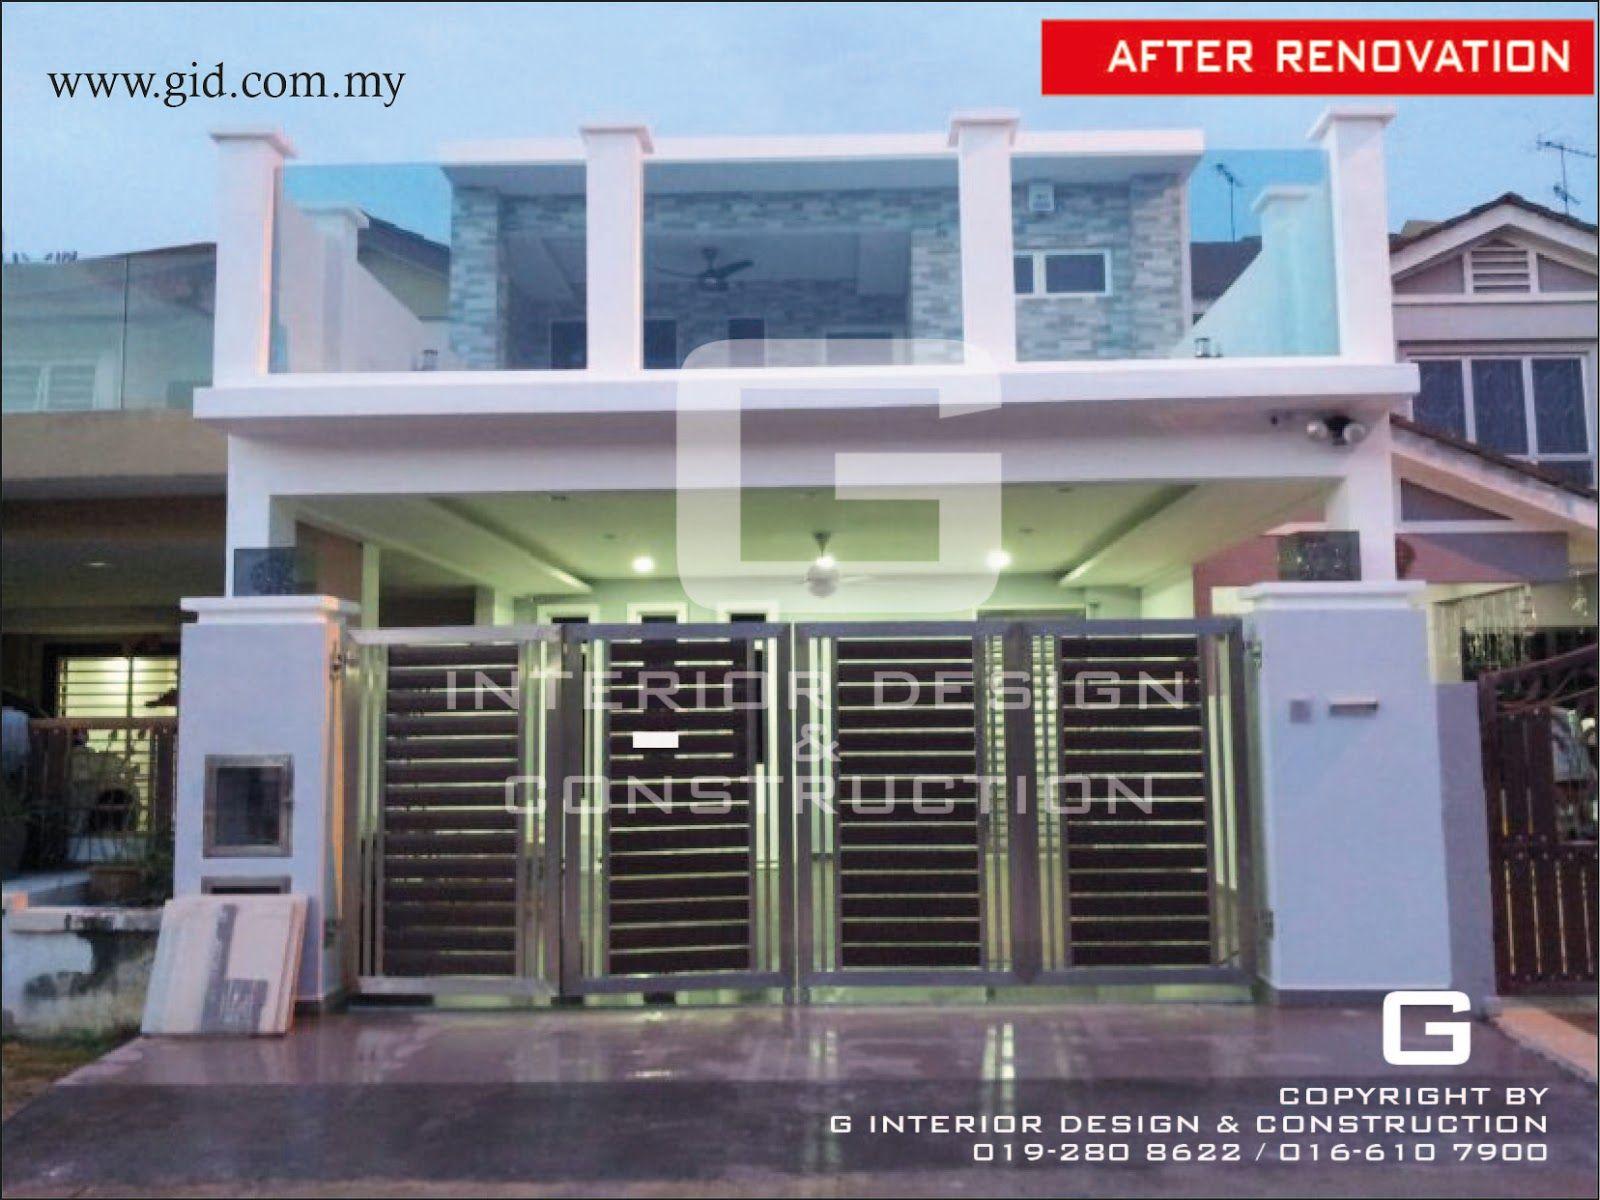 Another Design Of Auto Gate Renovations Design Kitchen Floor Plans